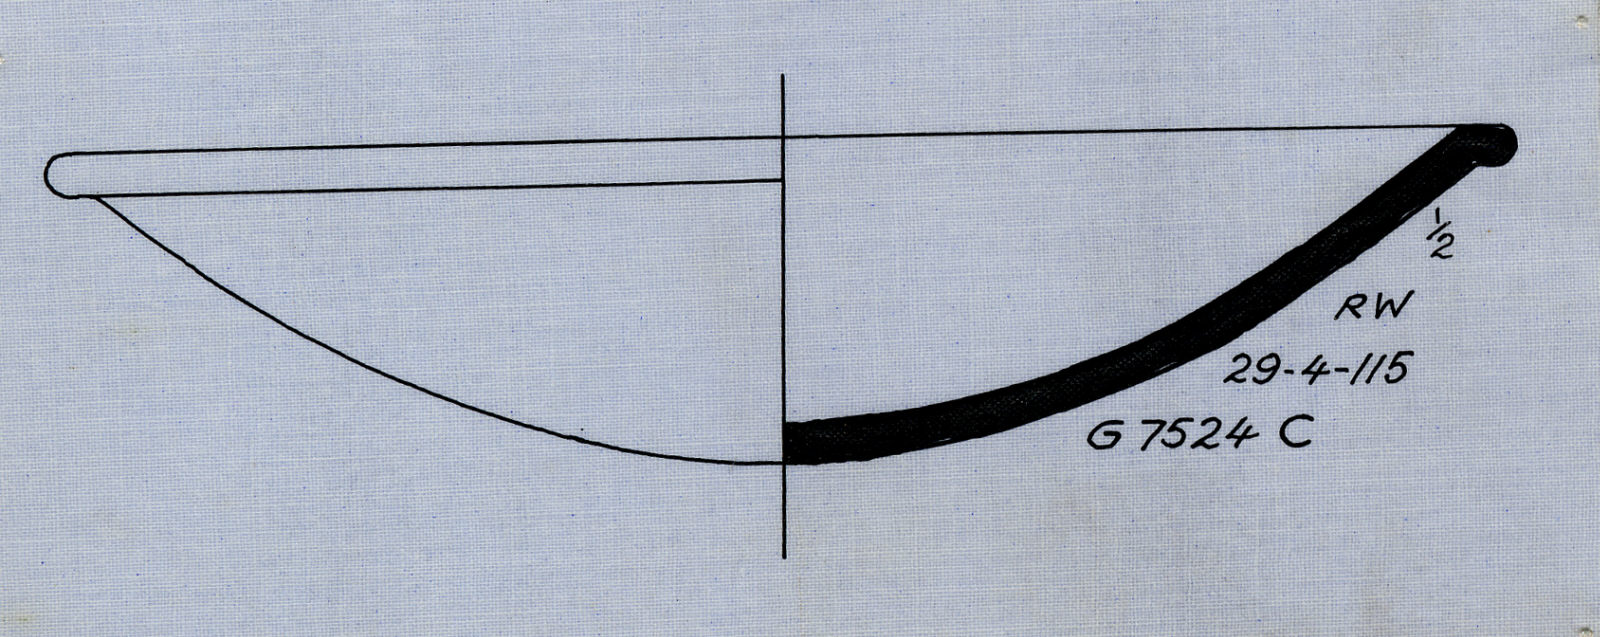 Drawings: G 7524, Shaft C: pottery, bowl